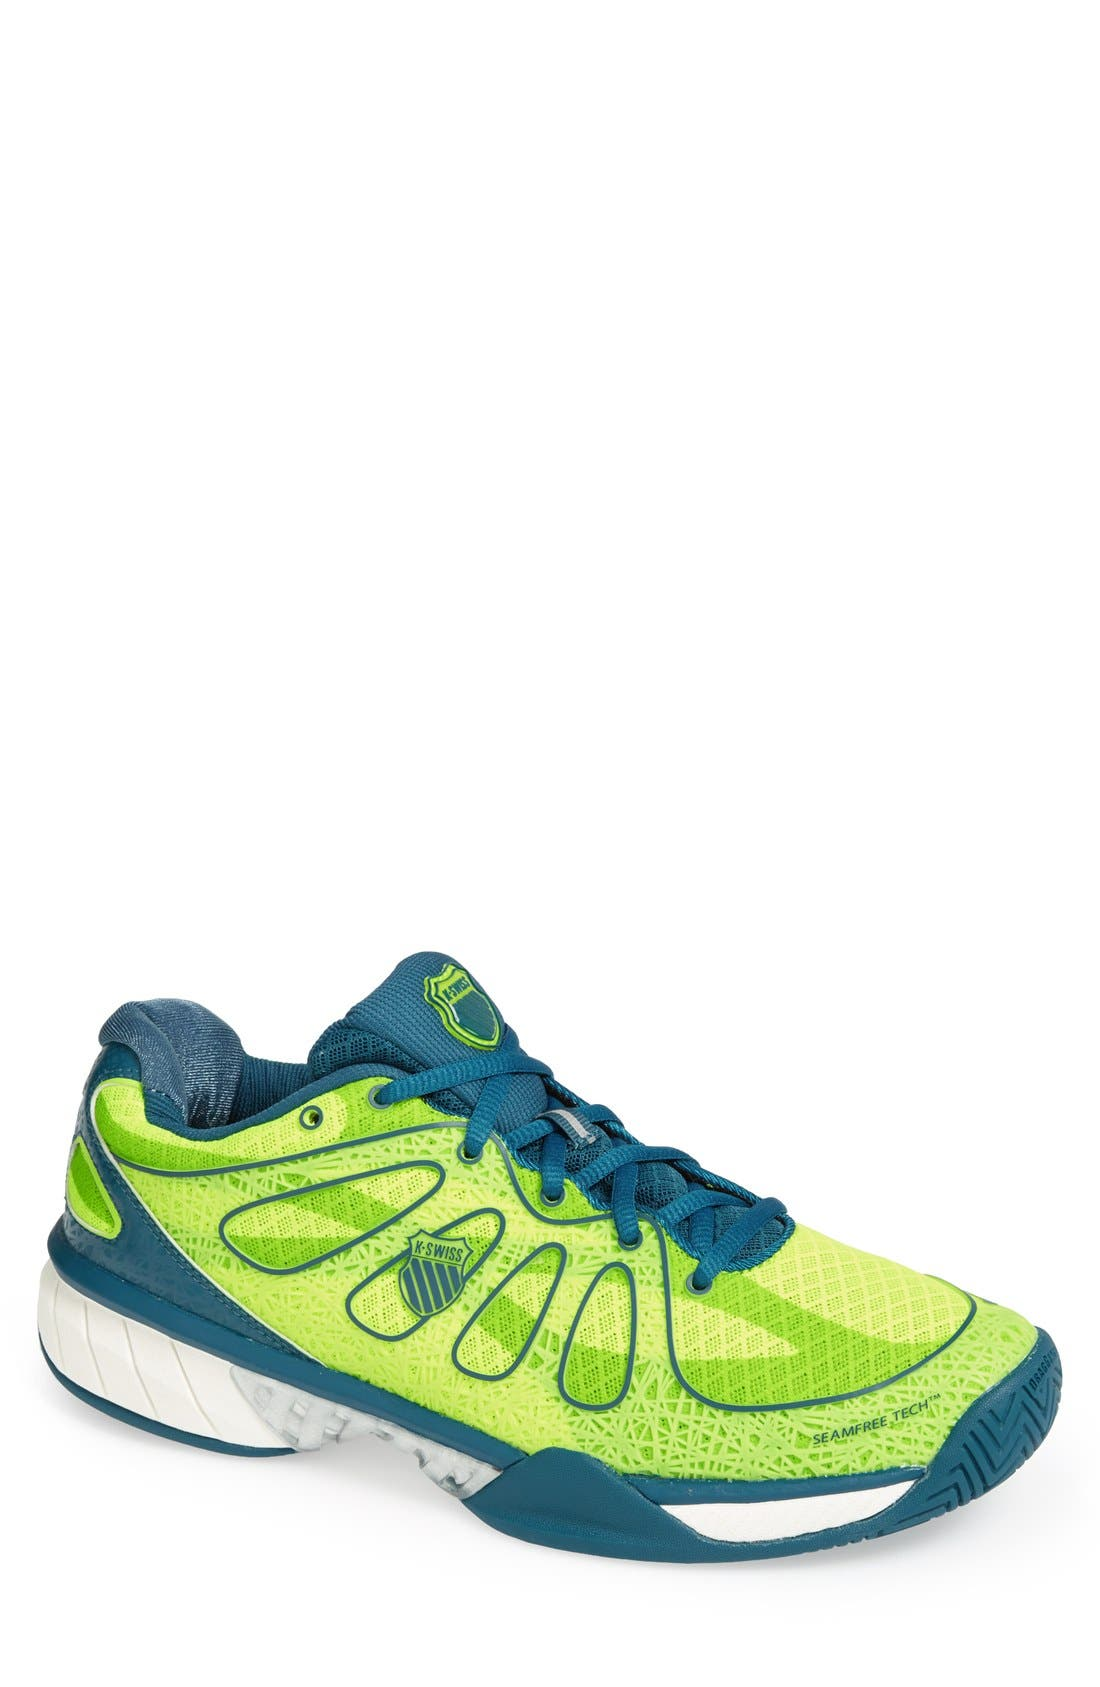 Alternate Image 1 Selected - K-Swiss 'Ultra Express' Tennis Shoe (Men)